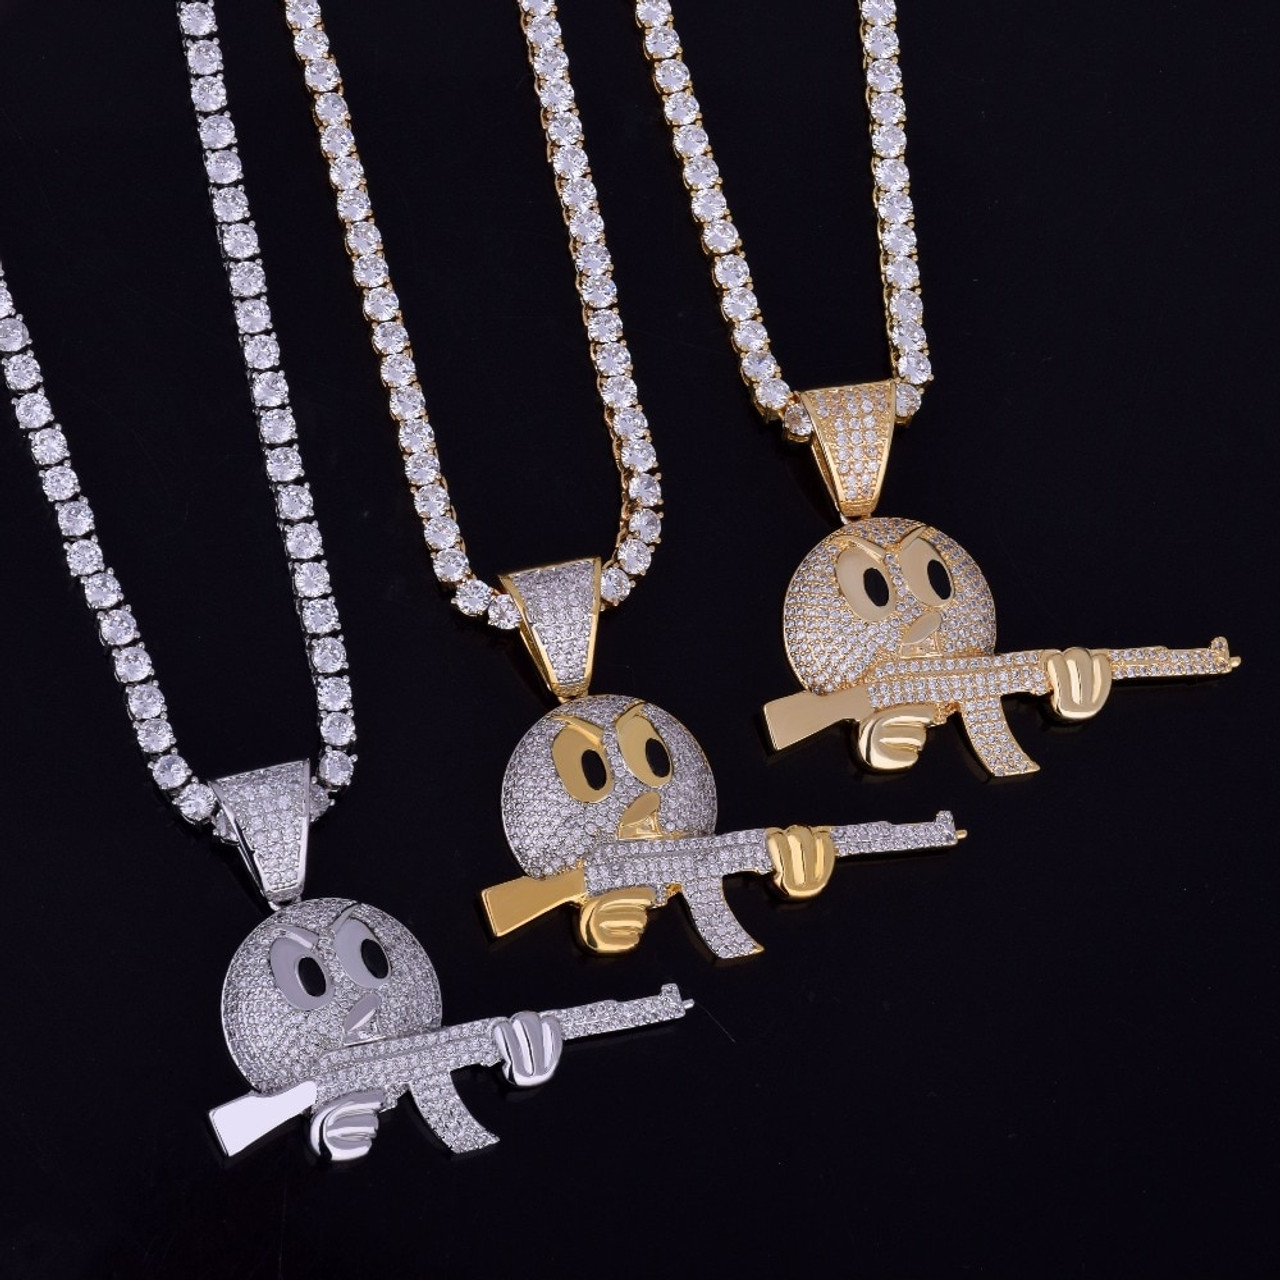 925 Sterling Silver AK47 Gun Hip Hop Bling Simulated Diamond Charm Pendant